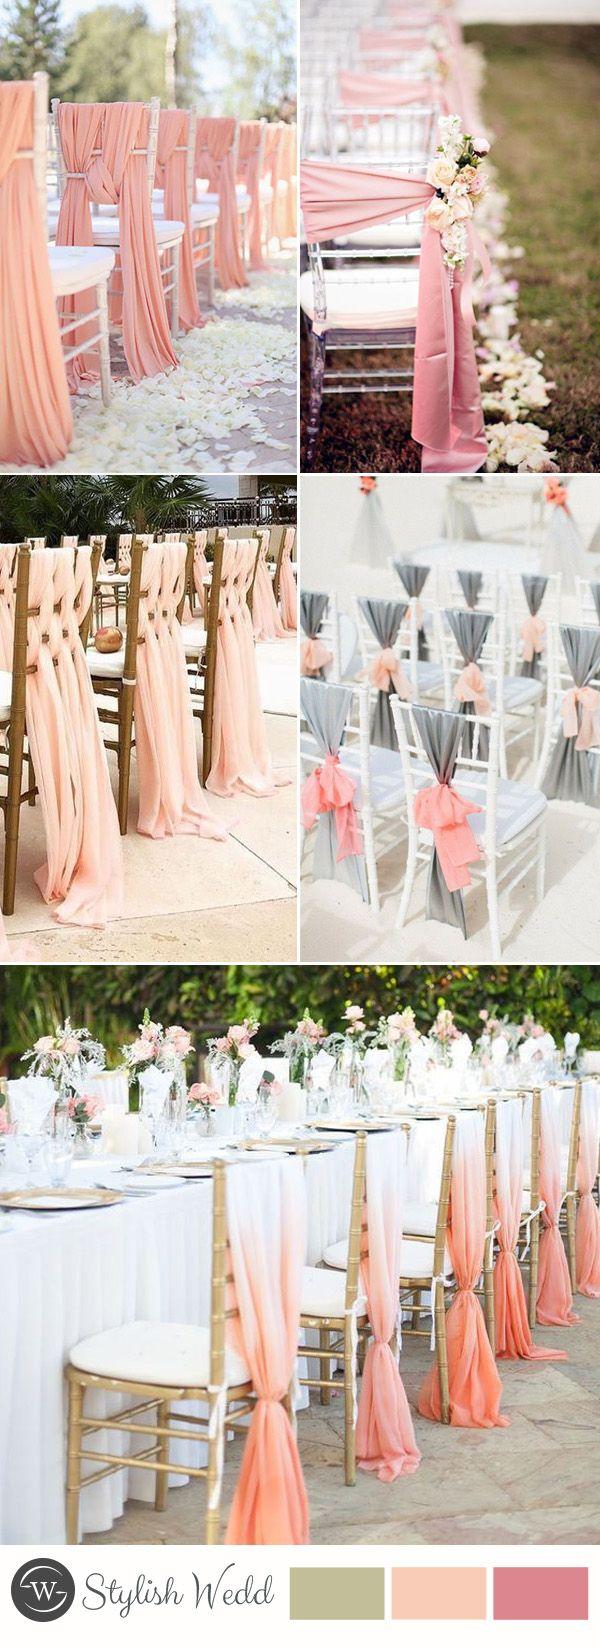 Antique wedding chair - 50 Great Ways To Decorate Your Weddding Chair Wedding